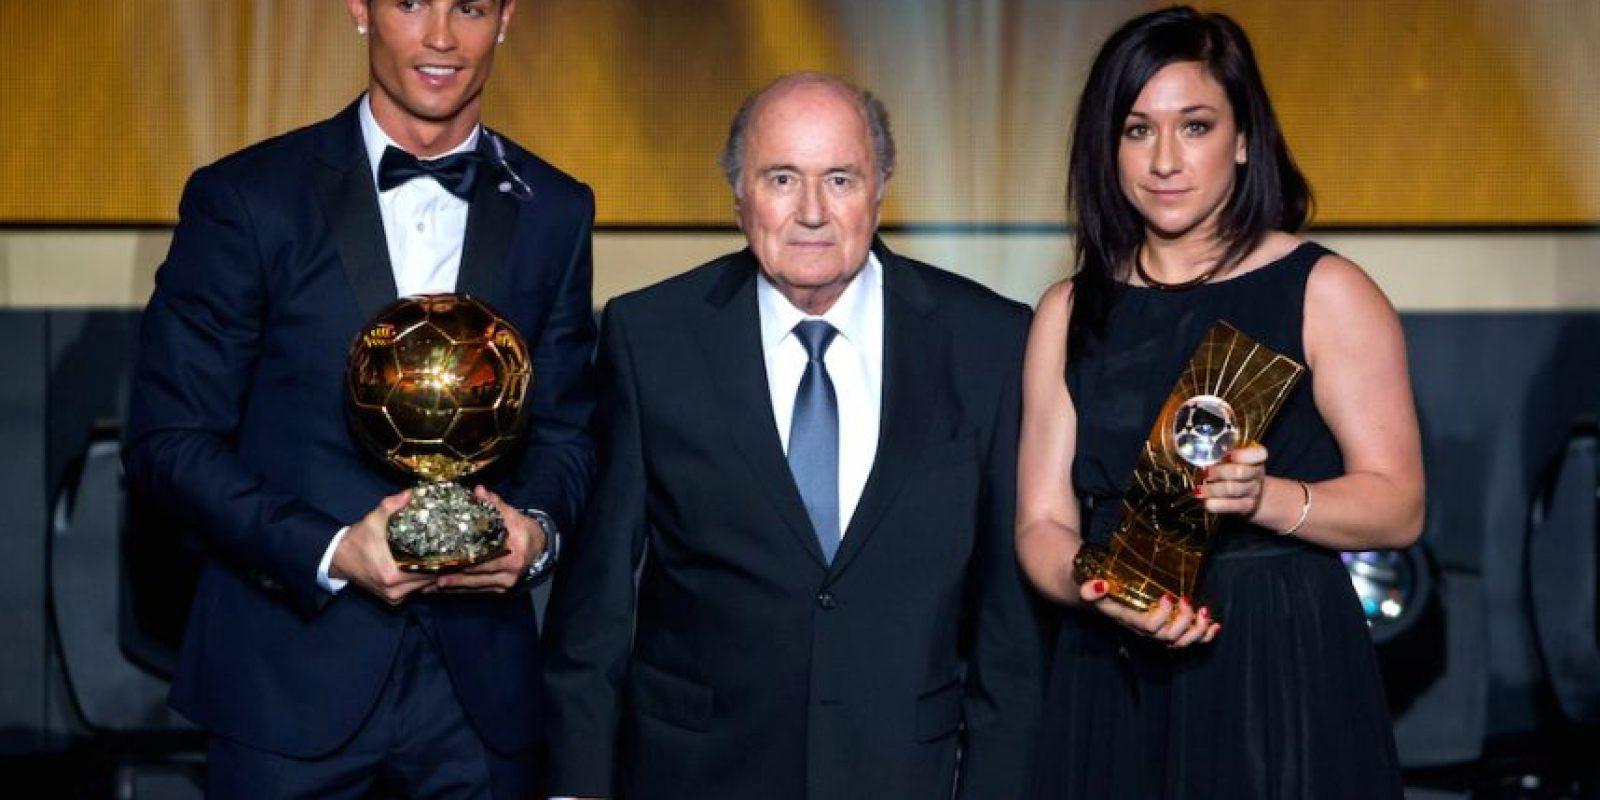 Cristiano Ronaldo, Joseph Blatter y Nadine Kessler. Foto:Getty Images